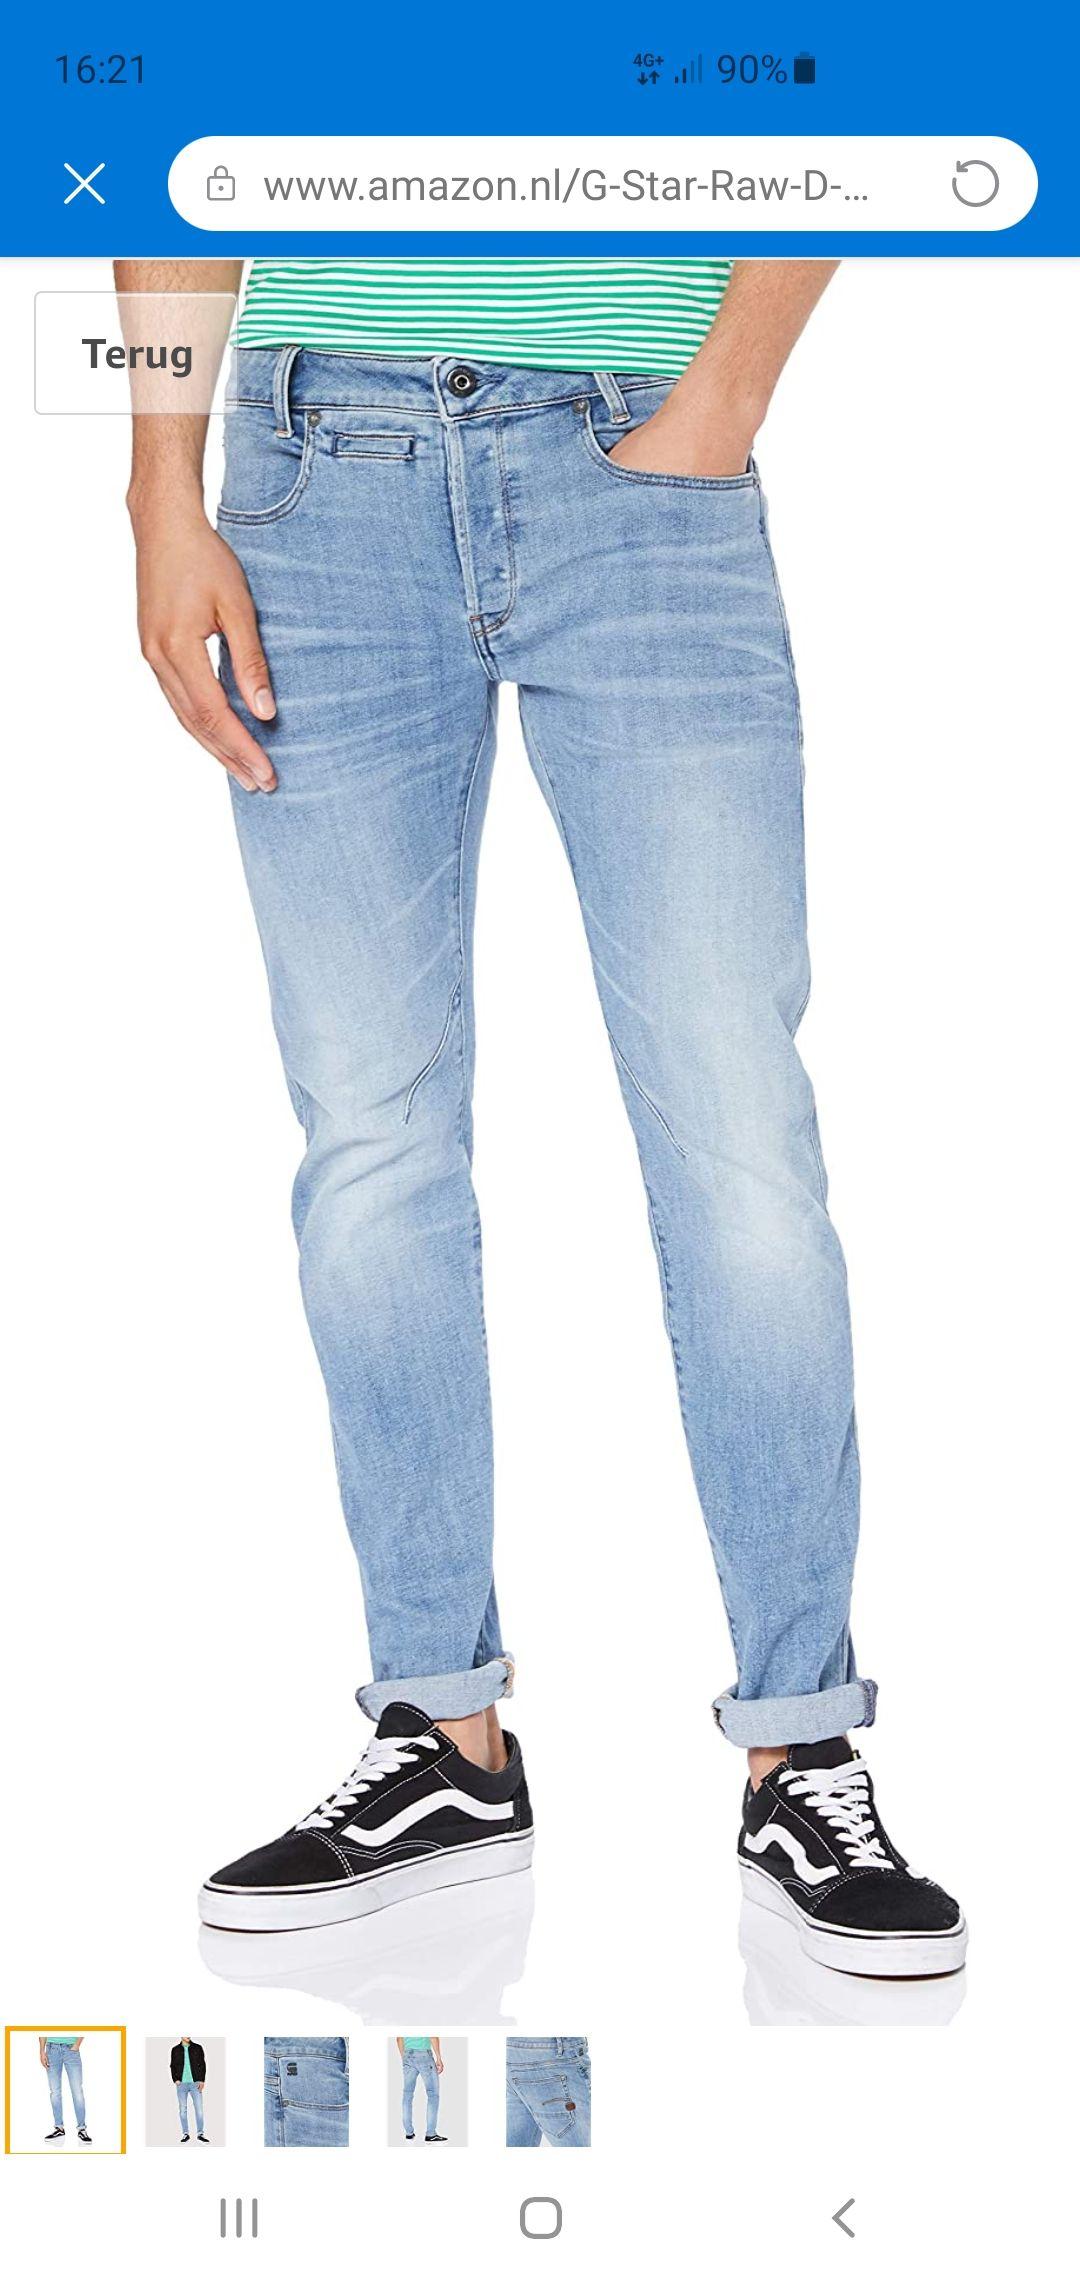 G-STAR RAW Heren Jeans D-staq 5-pocket Slim